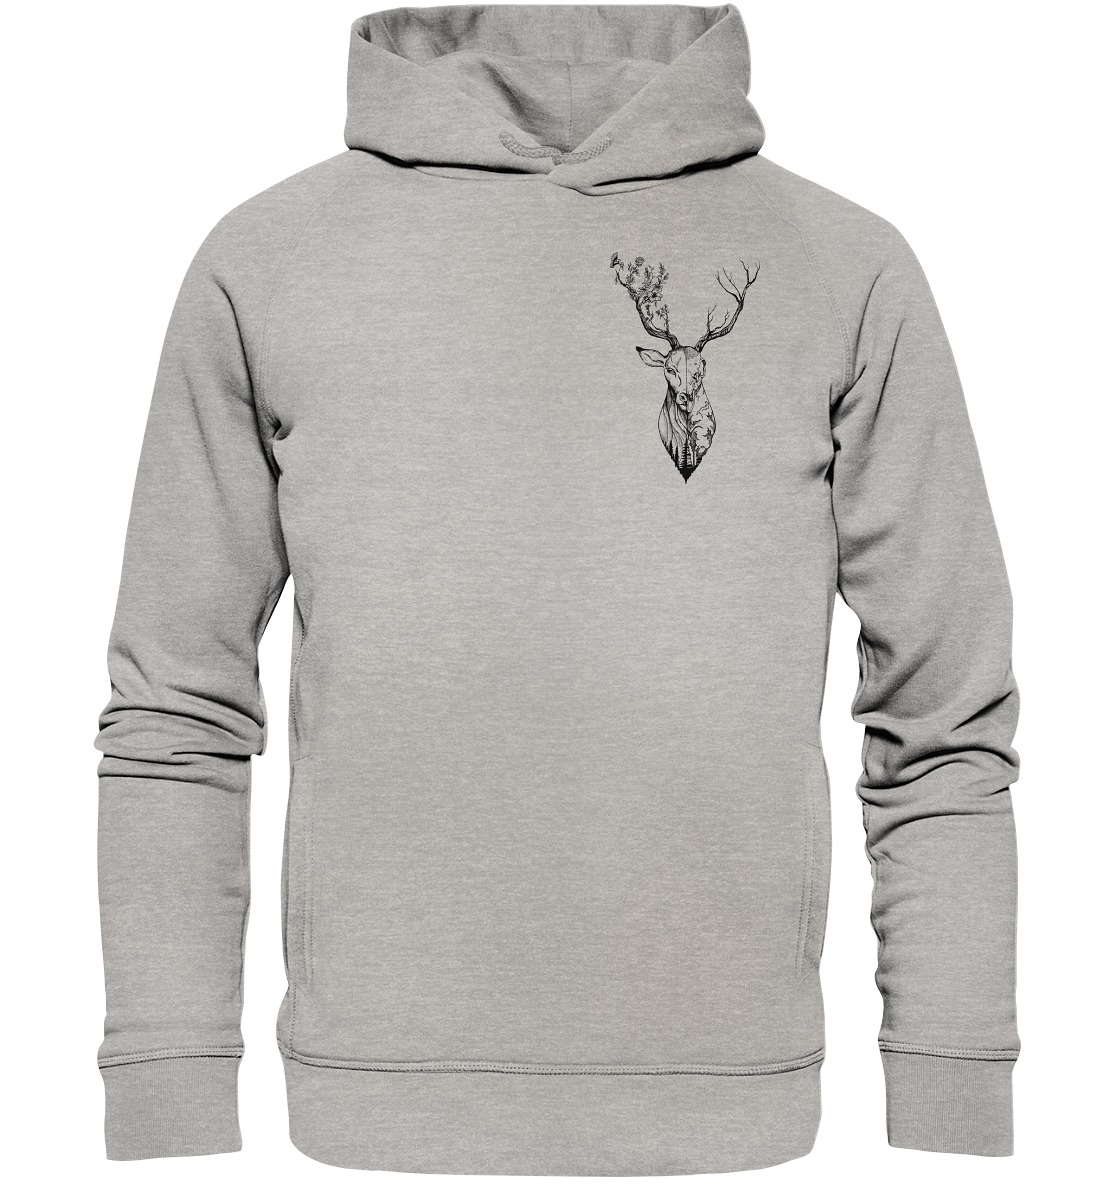 front-organic-fashion-hoodie-c2c1c0-1116x-7.png